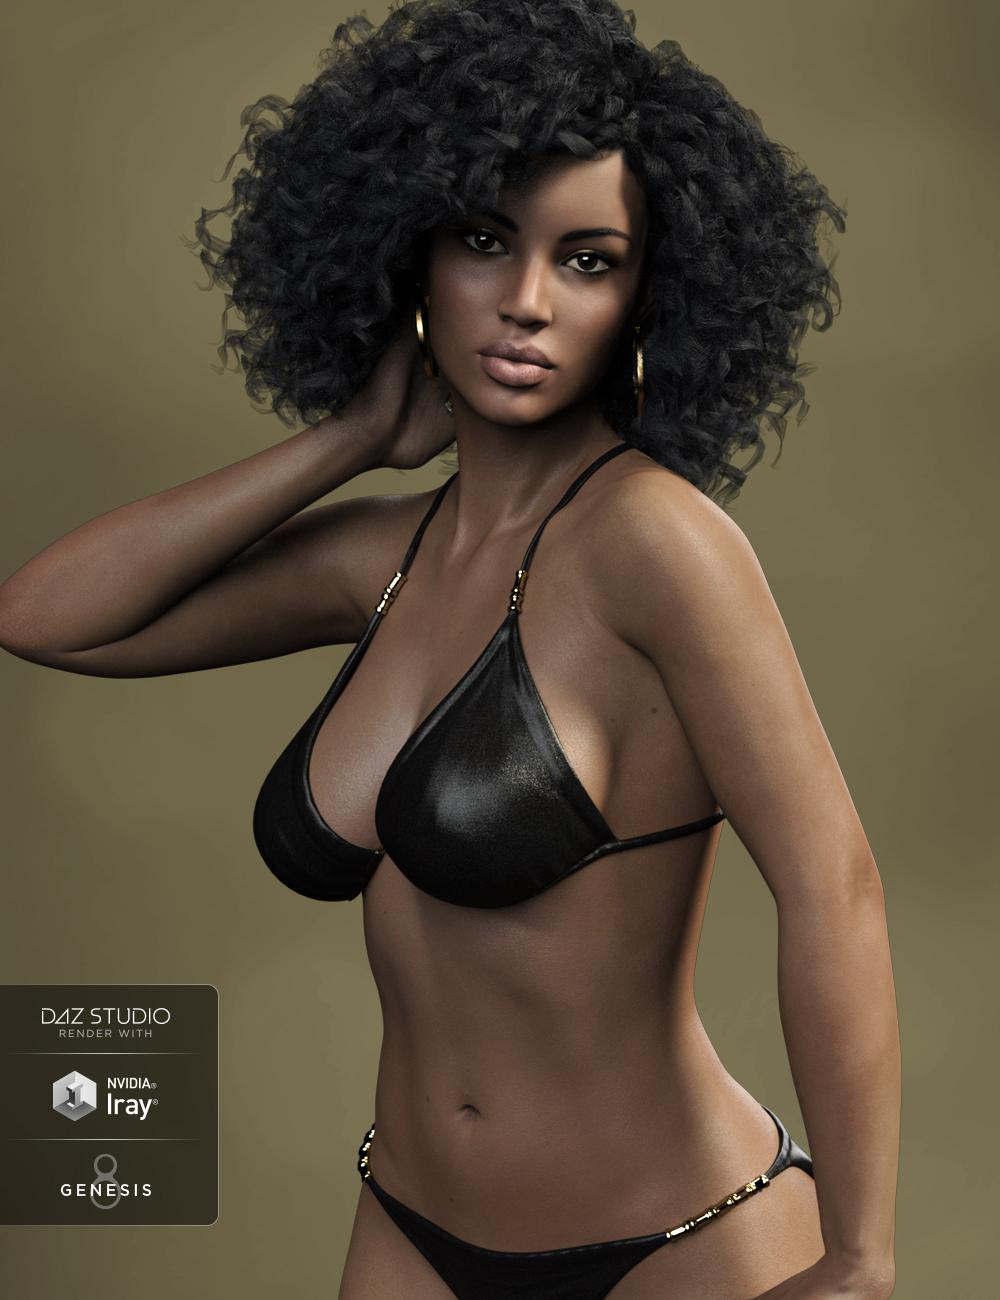 FW Laverne HD for Monique 8 by: Fred Winkler Art, 3D Models by Daz 3D